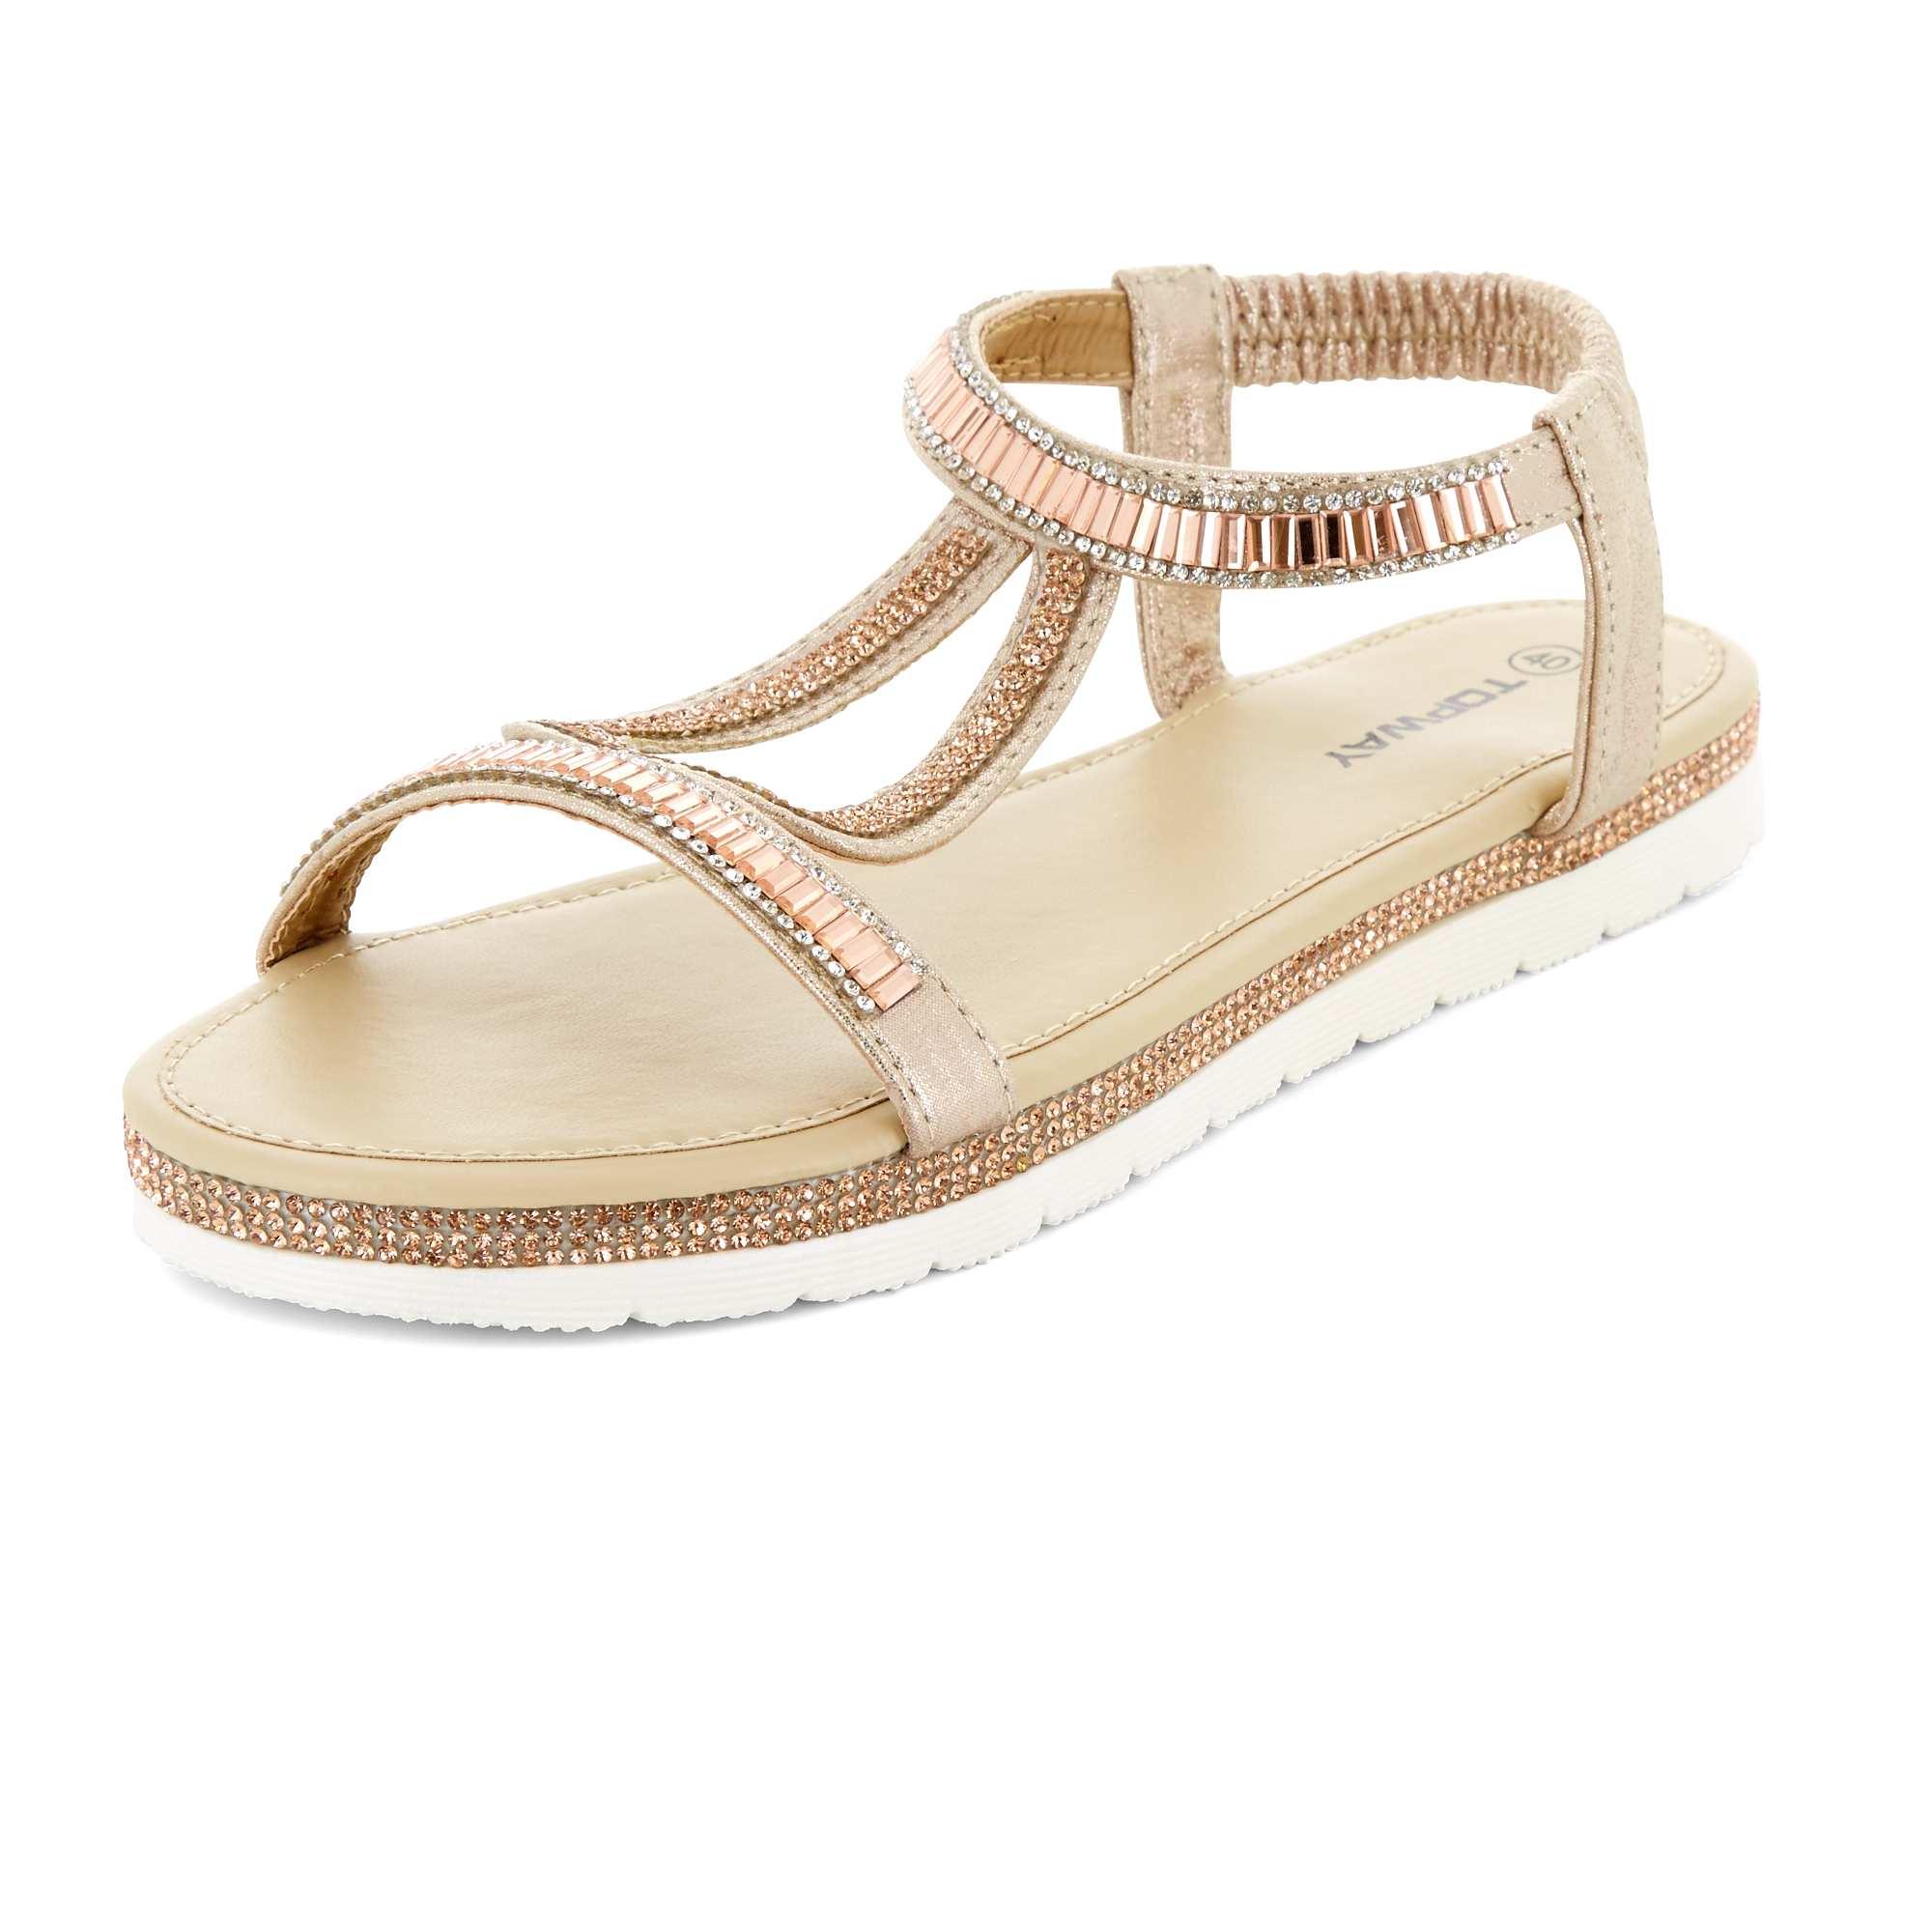 Sandale Stxhcbqrdo Plate Chaussure Lescahiersdalter Kiabi Femme 35jALSqc4R